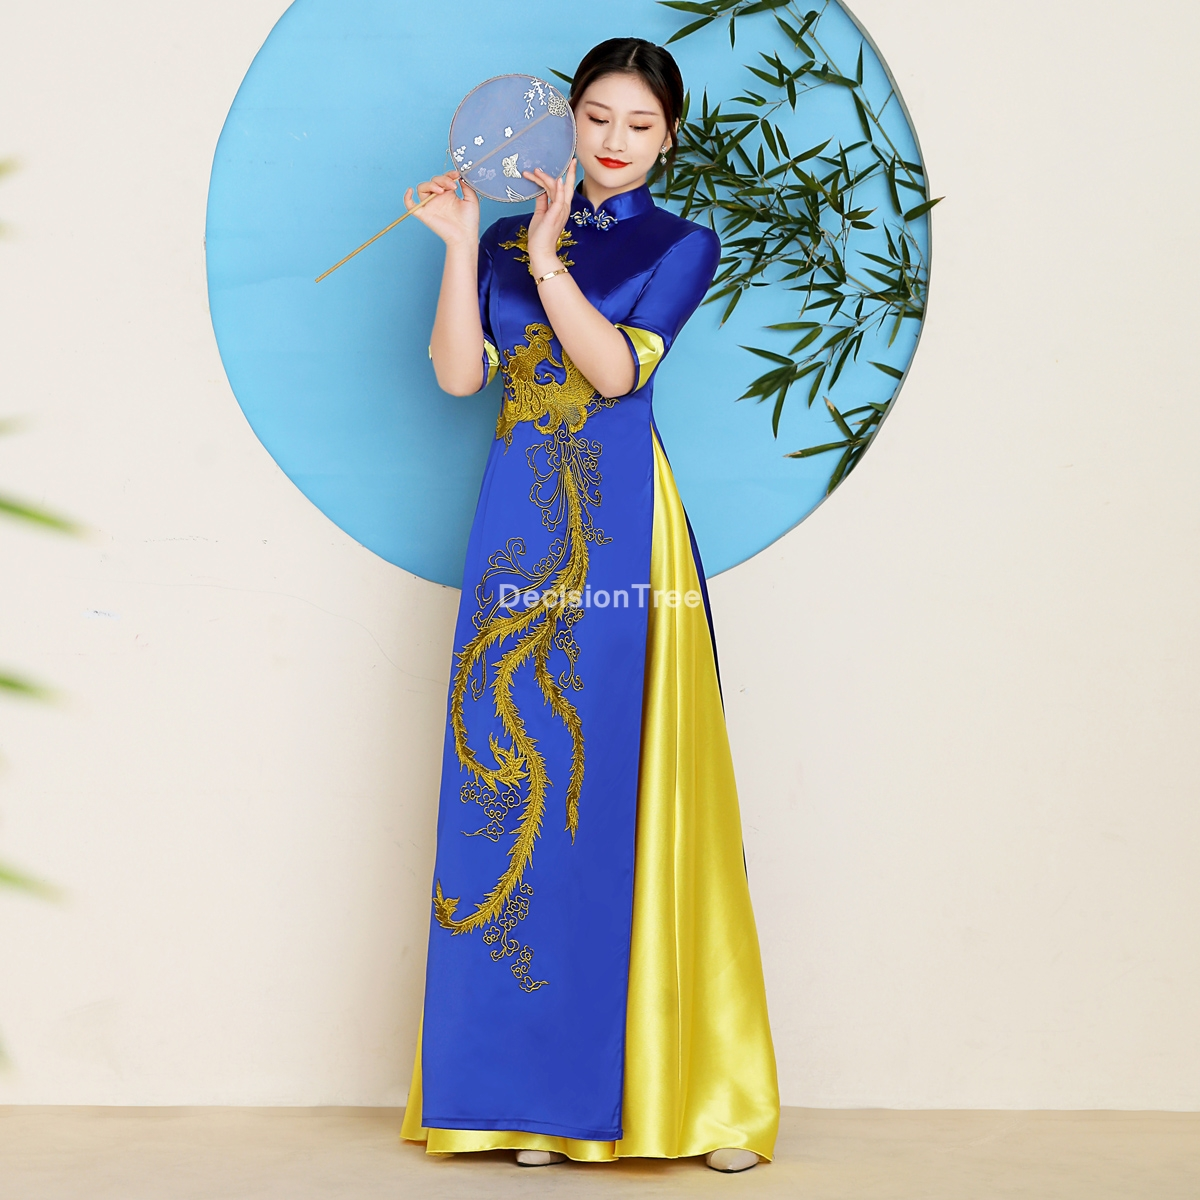 2021 woman aodai vietnam traditional clothing vietnam dress flower embroidery  aodai dress improved cheongsam ethnic style dress